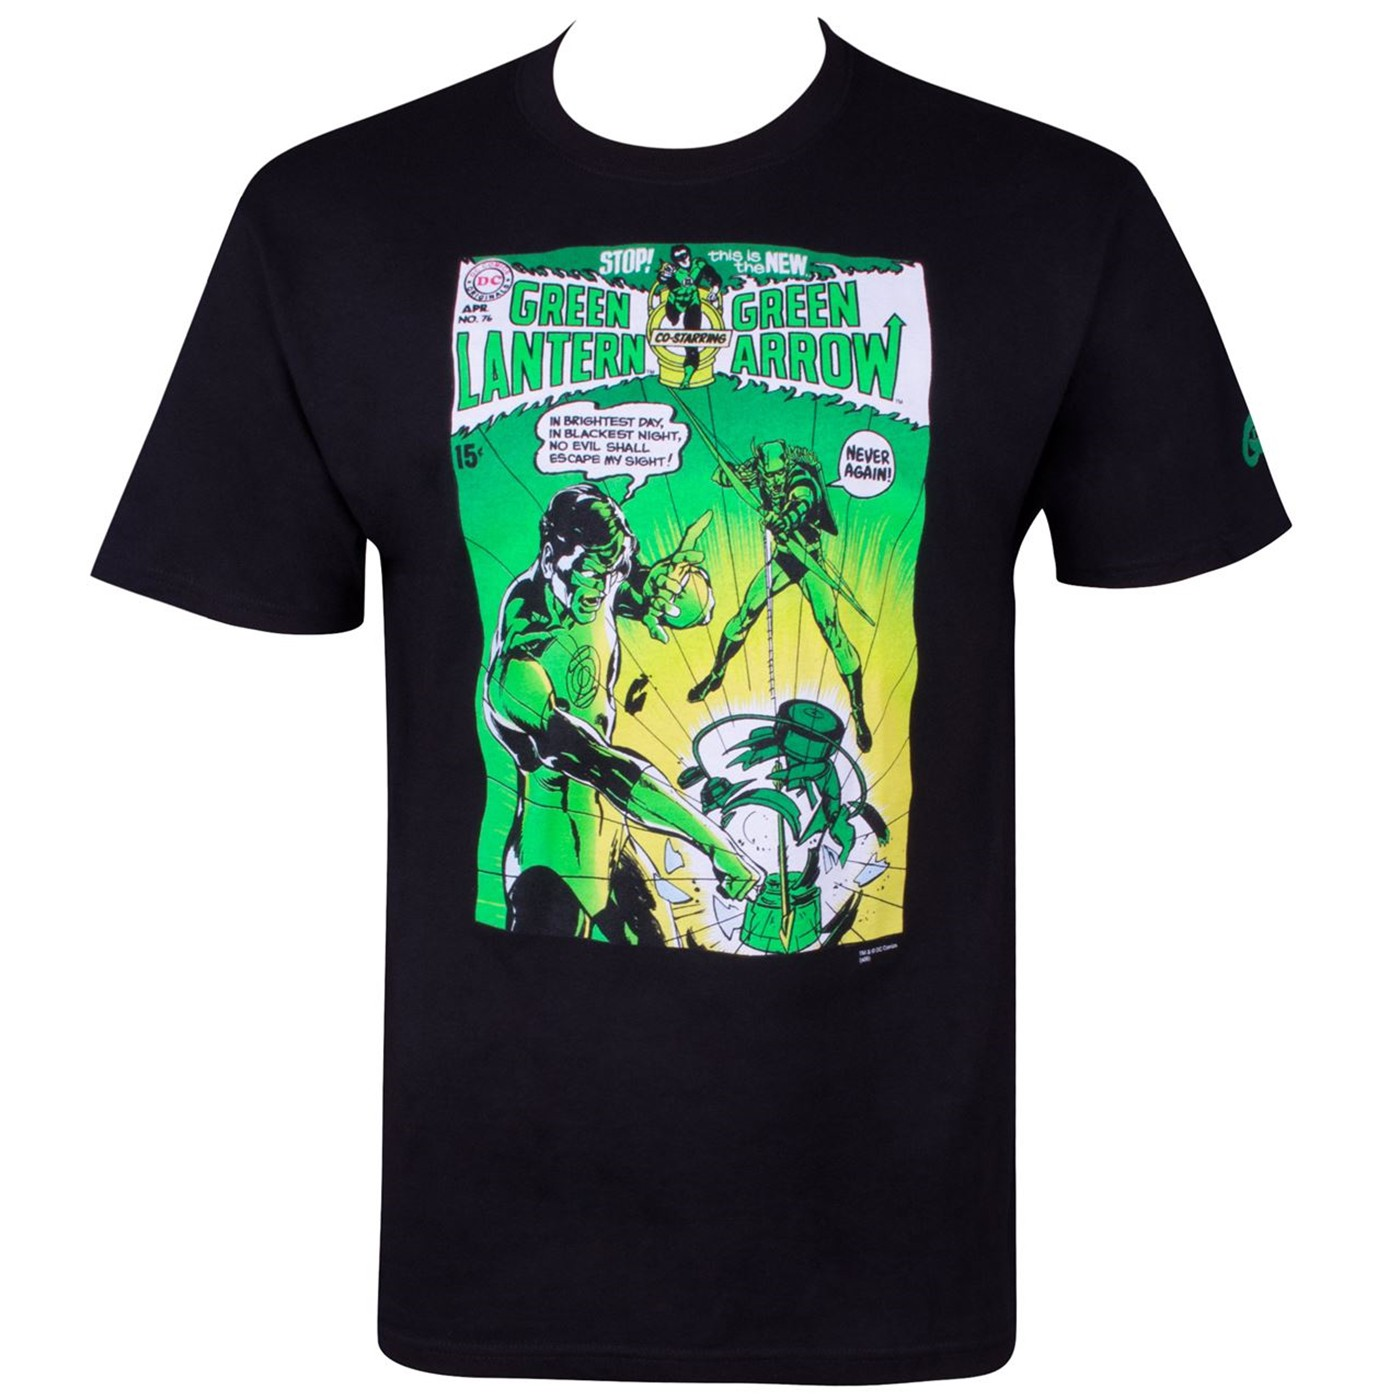 Green Lantern and Green Arrow #76 Comic by Neal Adams Men's T-Shirt